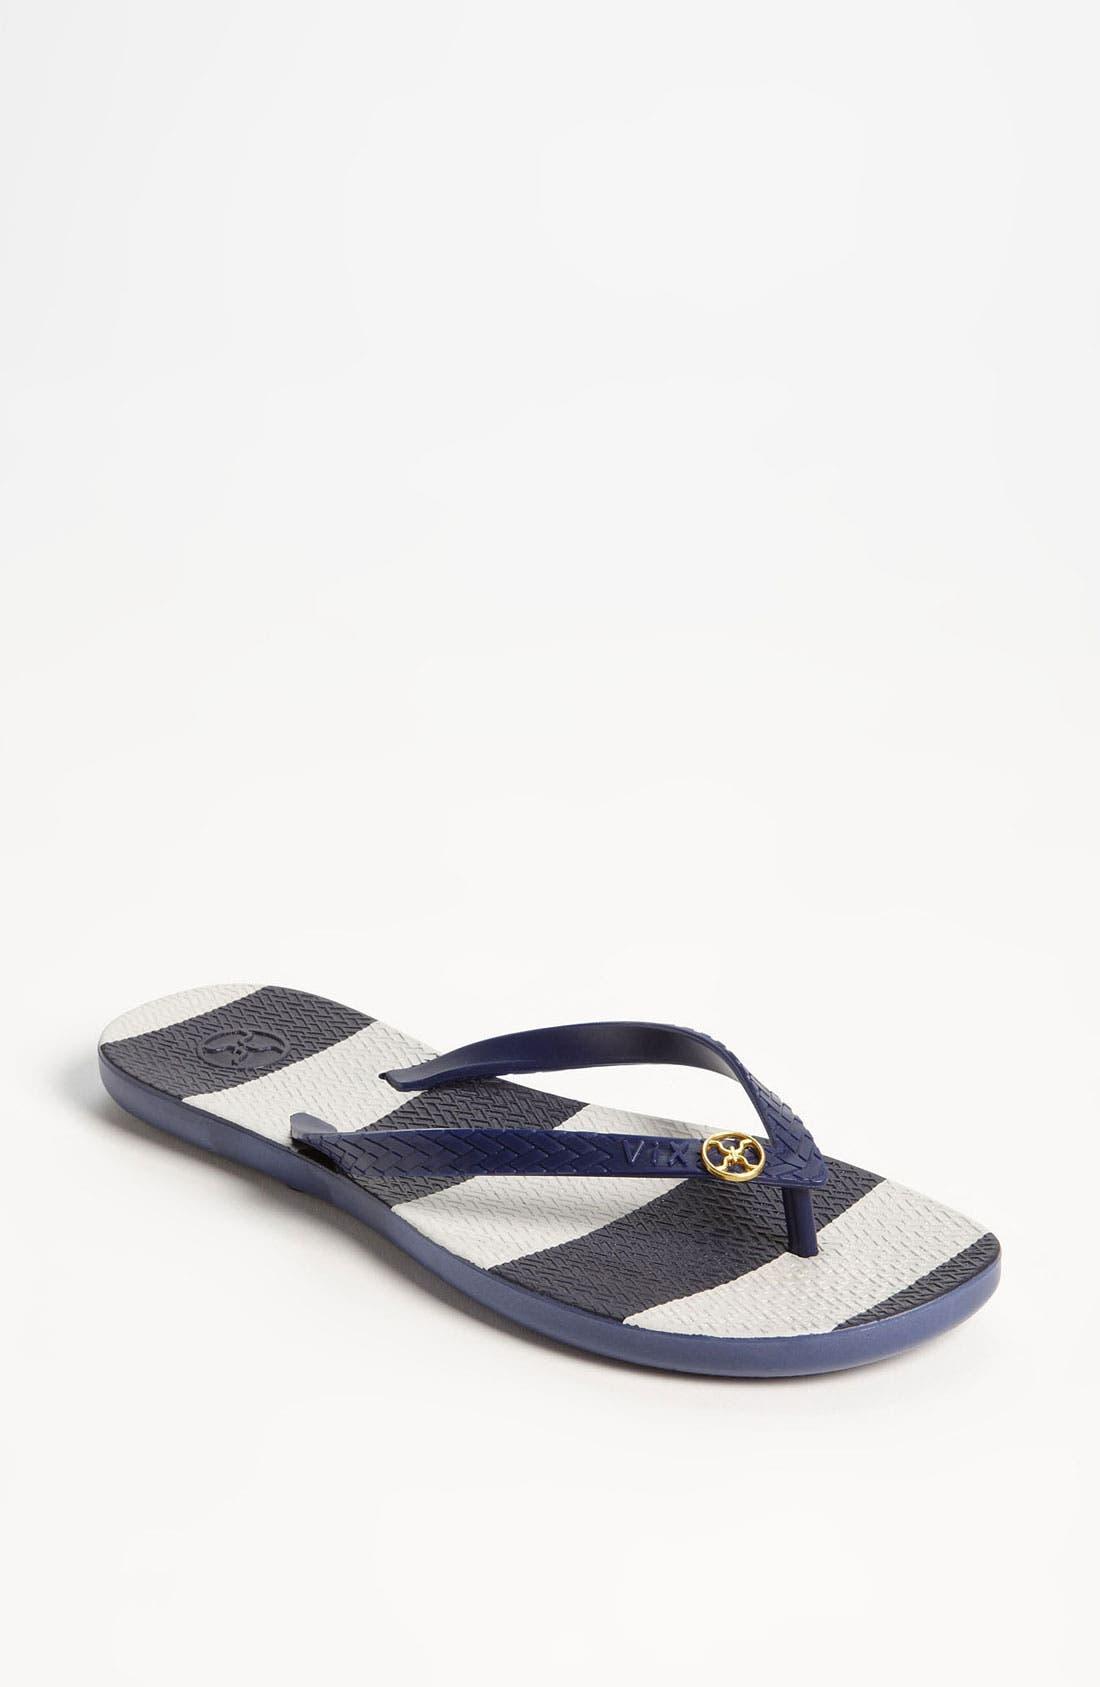 Alternate Image 1 Selected - ViX Swimwear 'Malawi' Sandal